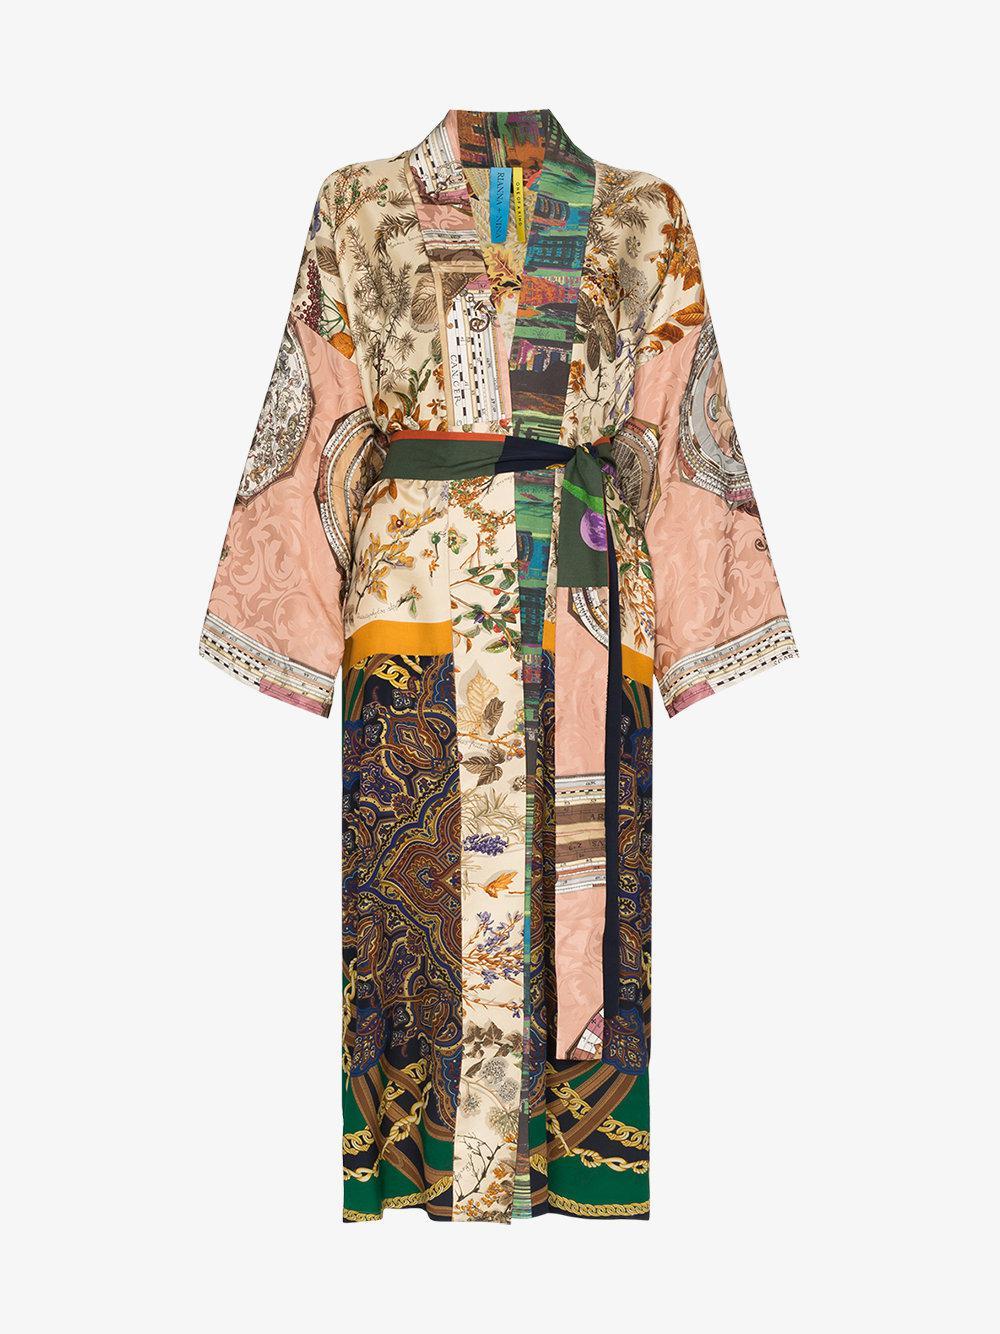 84e9ace85a Lyst - Rianna + Nina Long Multi Floral Print Silk Kimono Robe